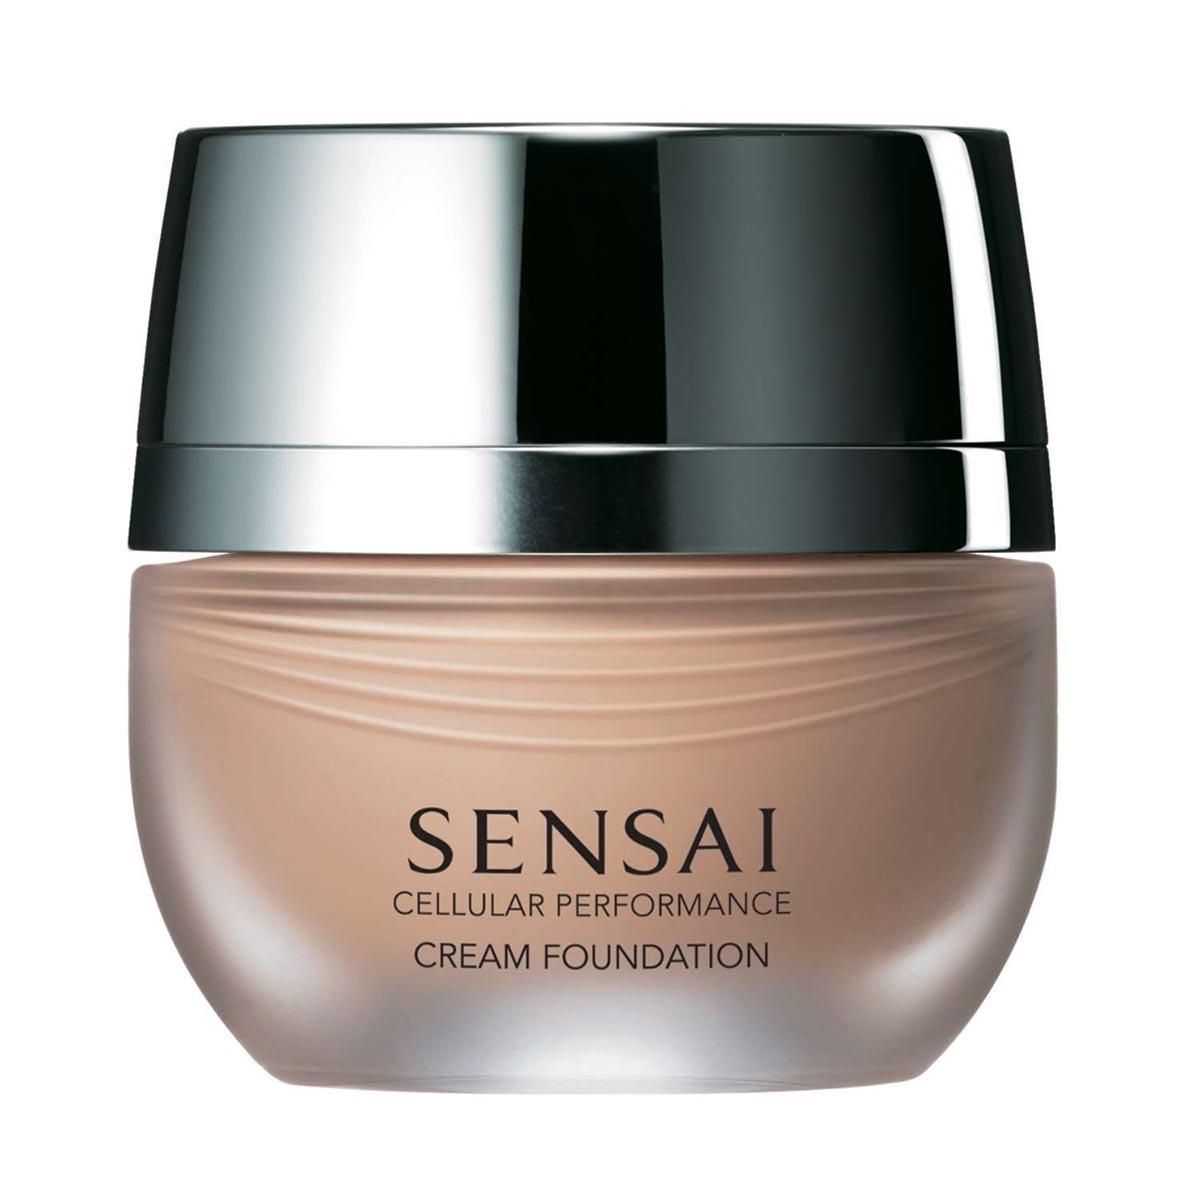 Sensai Cellular Performance Cream Foundation Base de maquillaje